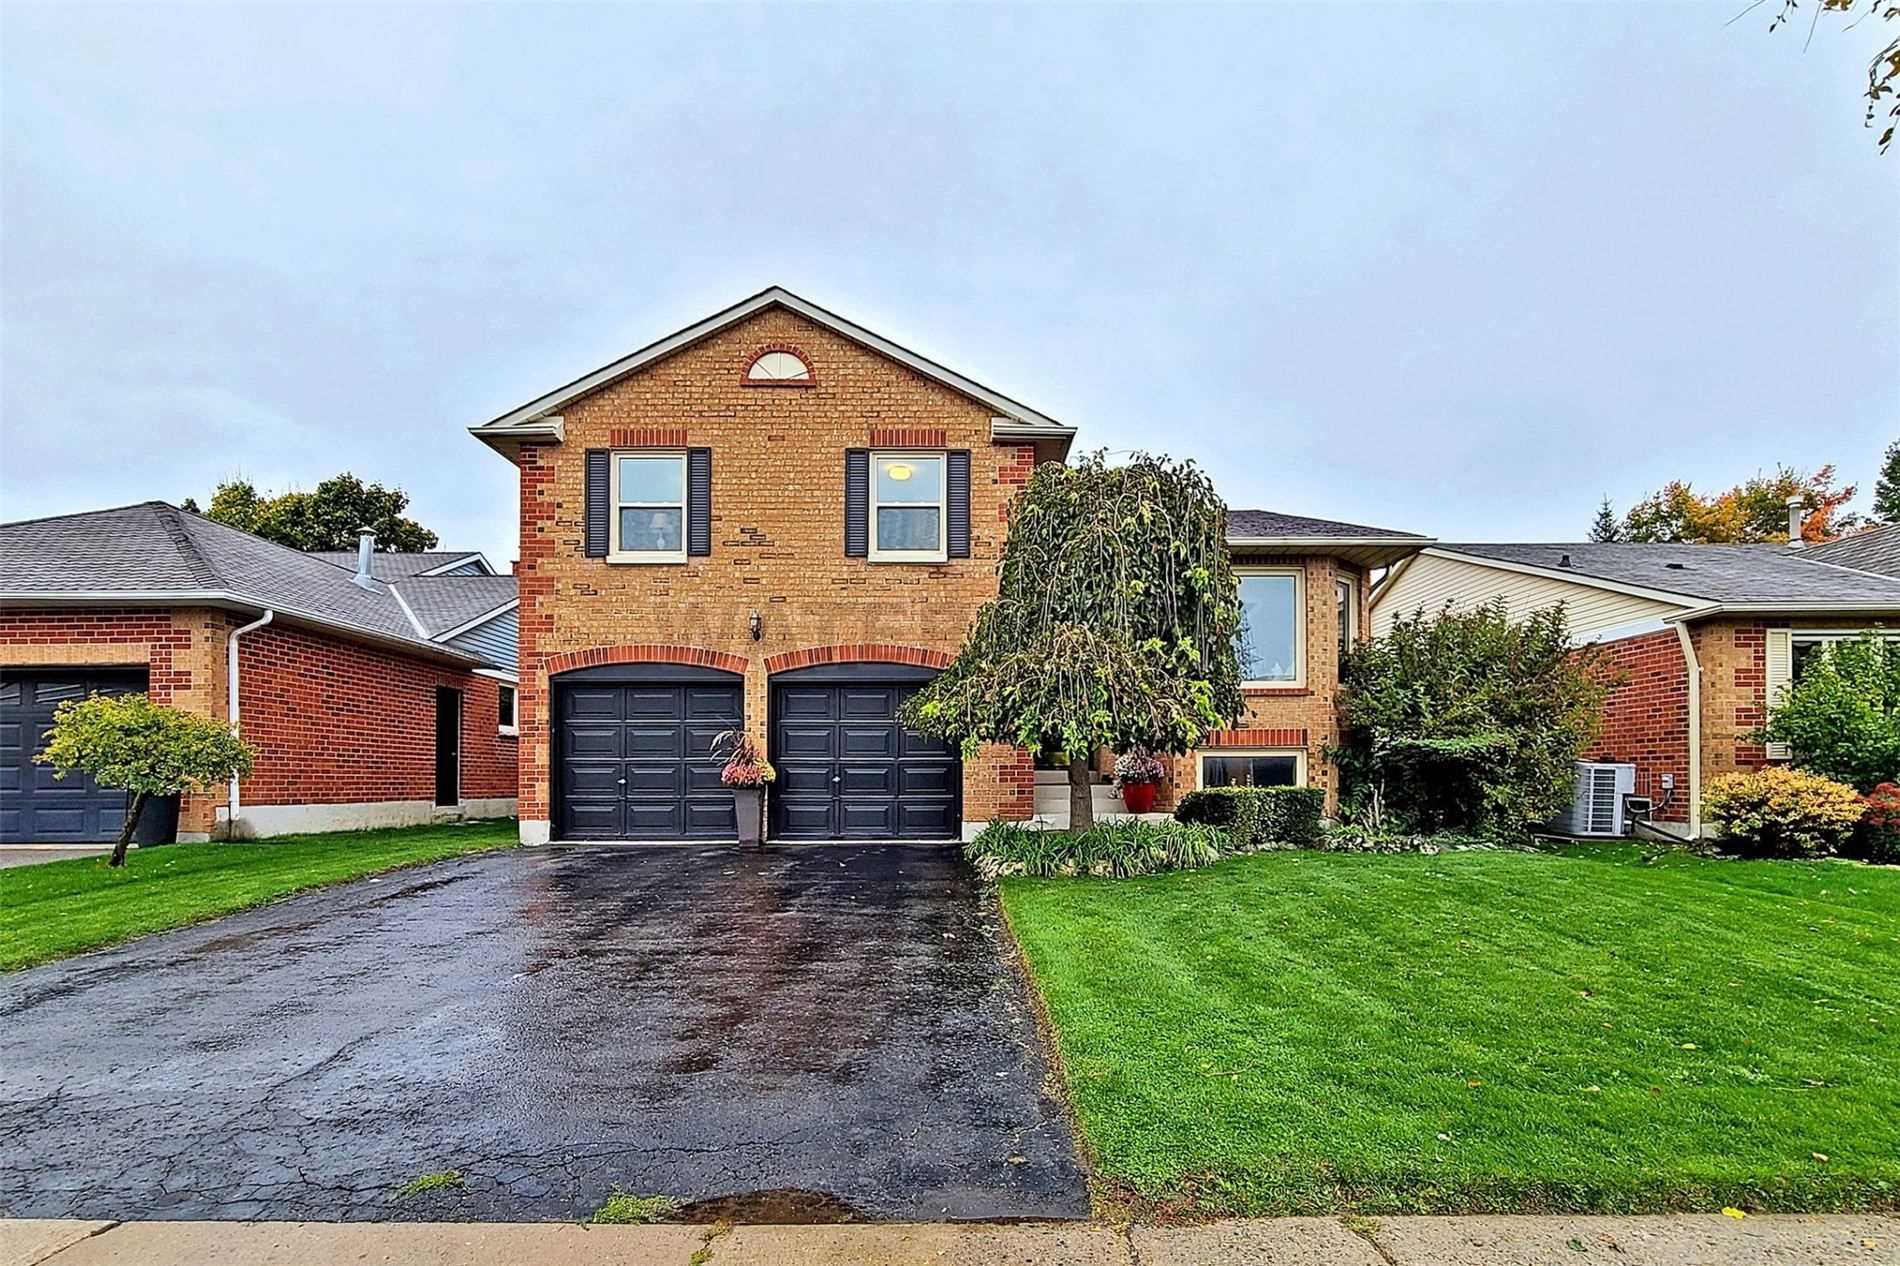 375 Crossland Gate, Newmarket, Ontario L3X1B6, 3 Bedrooms Bedrooms, 7 Rooms Rooms,3 BathroomsBathrooms,Detached,For Sale,Crossland,N4956296